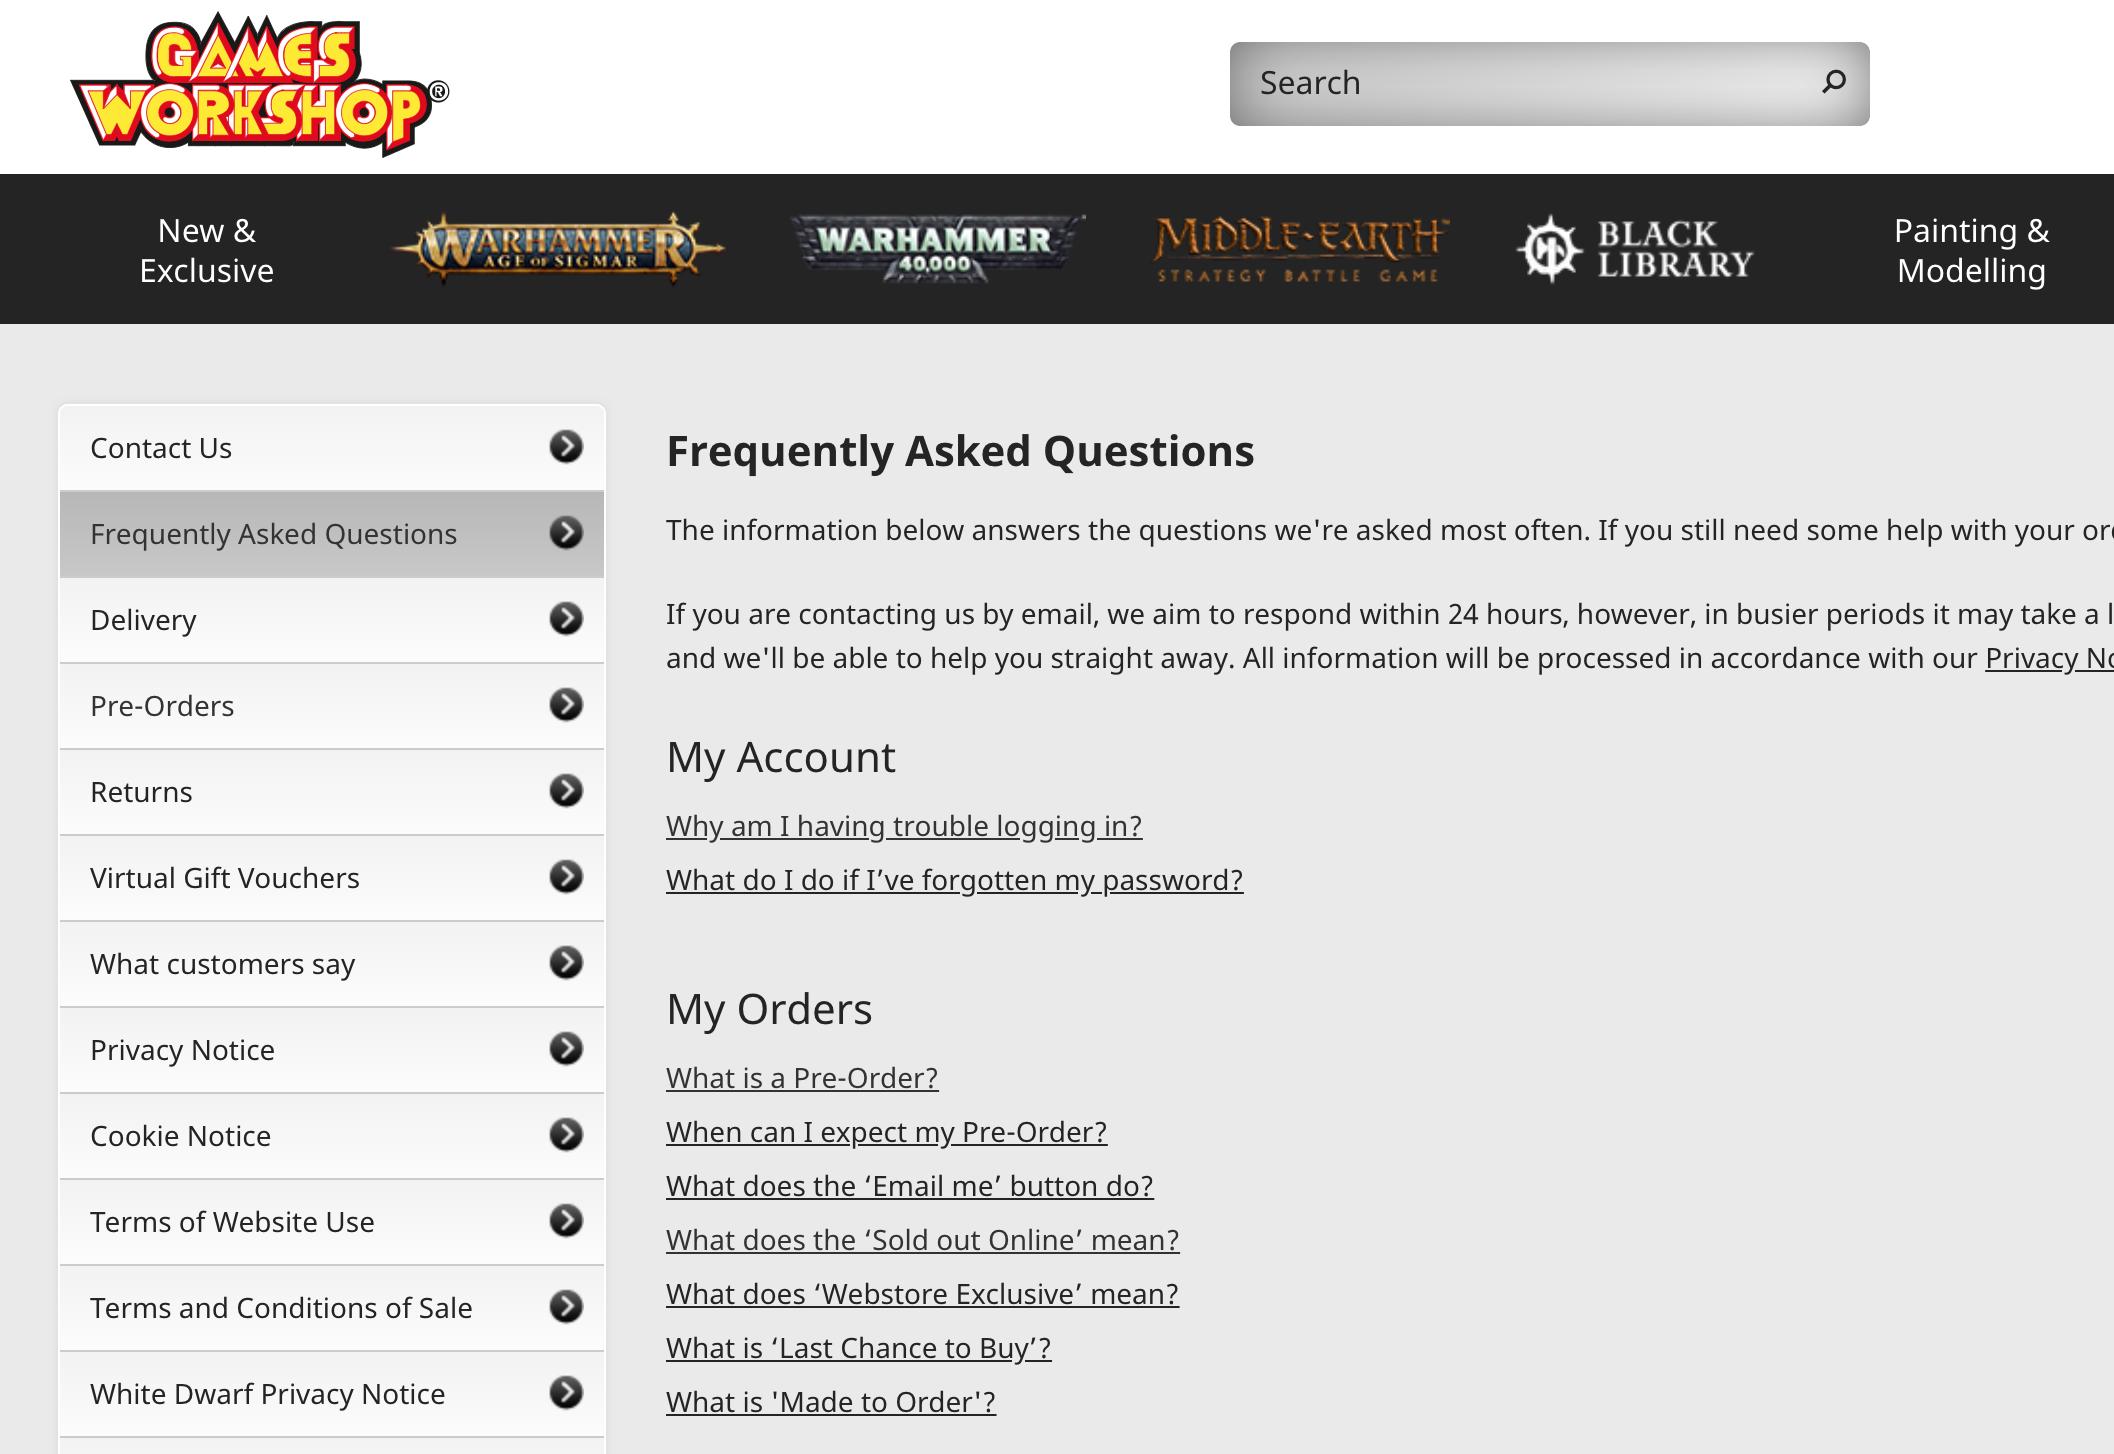 FAQ examples - Games Workshop FAQ